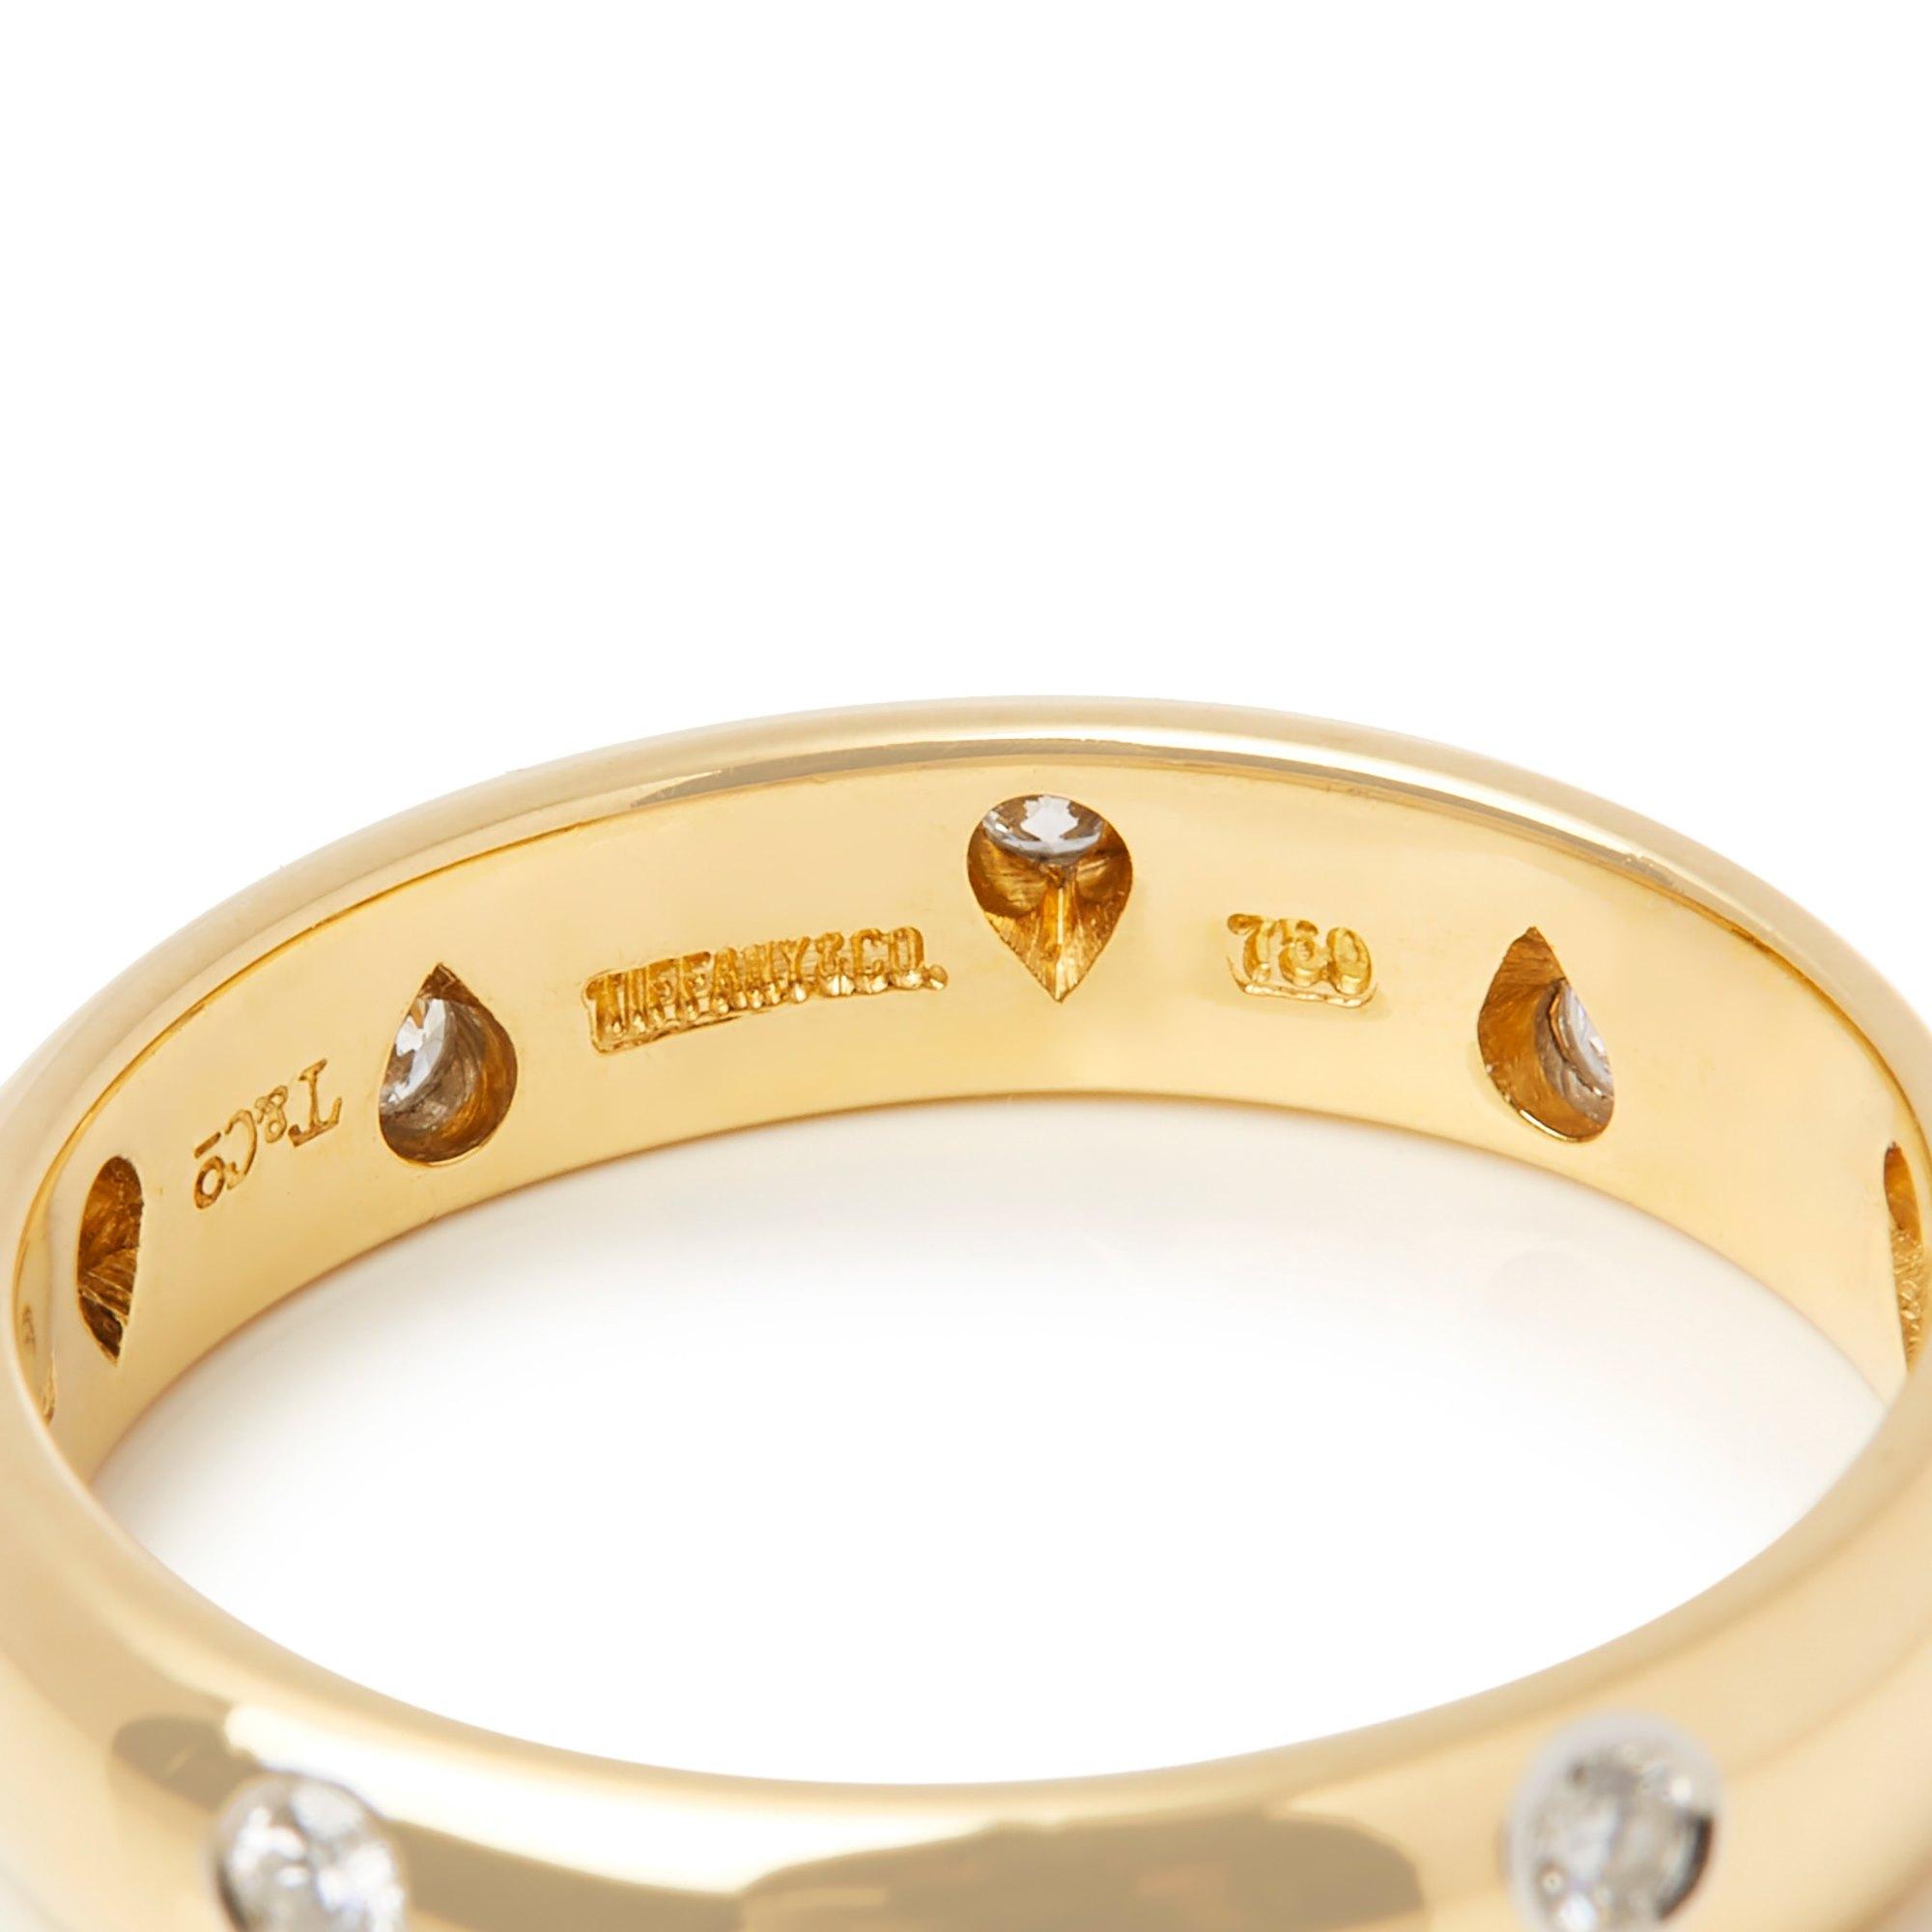 Tiffany & Co. 18k Yellow Gold Etoile Ring